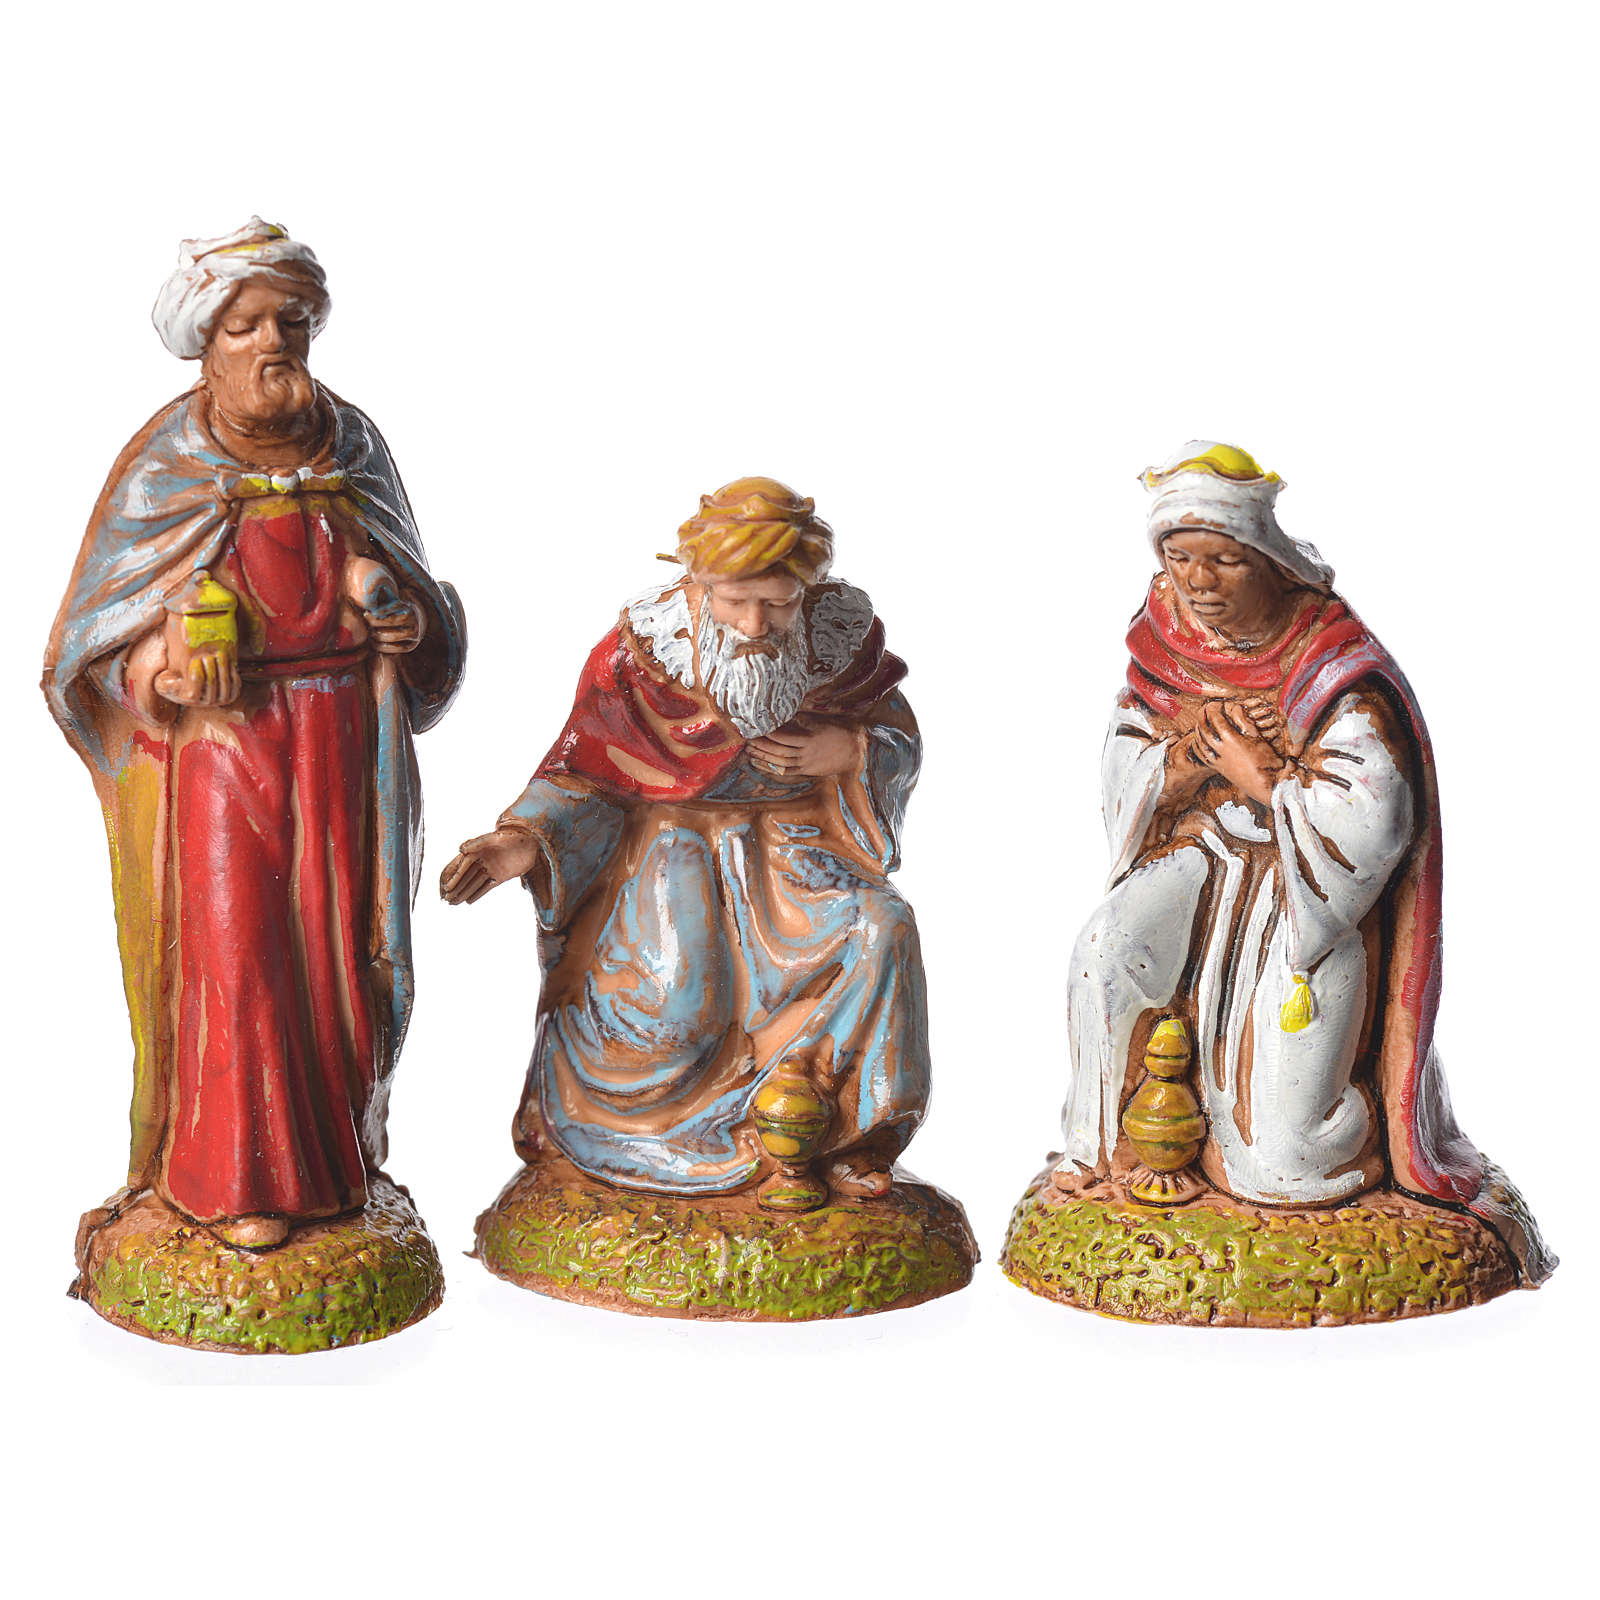 Wise men, 3 nativity figurines, 6cm Moranduzzo 4